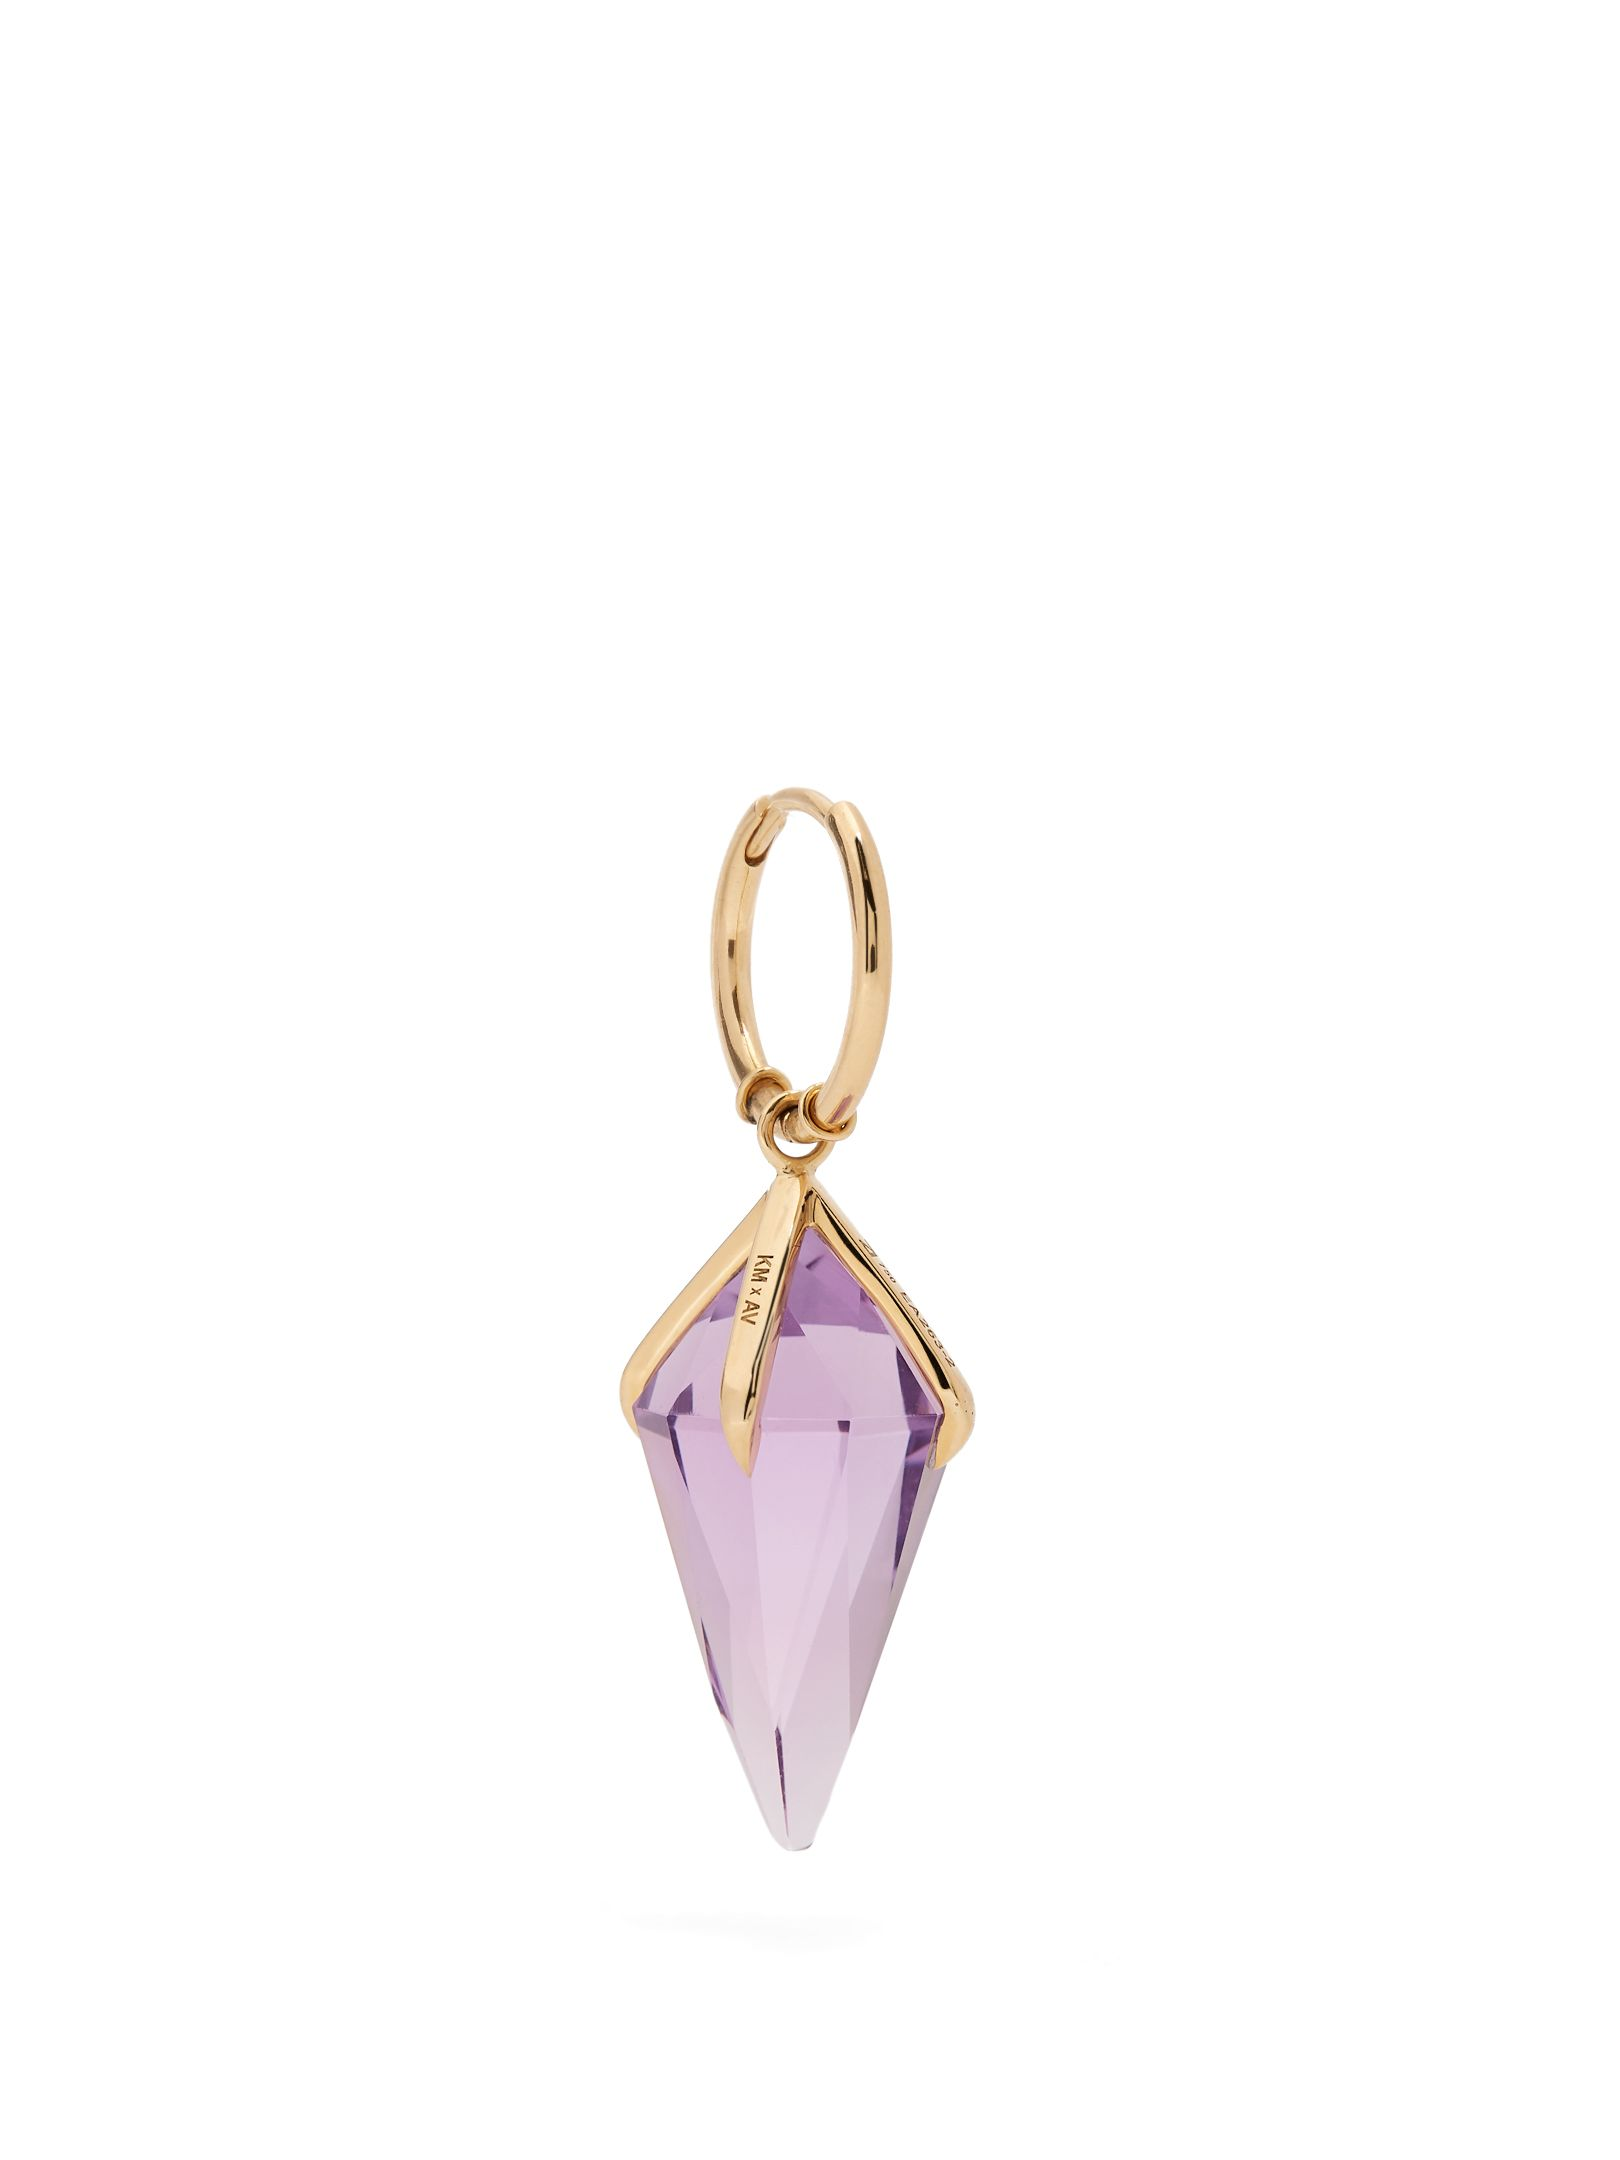 Ara Vartanian X Kate Moss diamond, amethyst & gold necklace